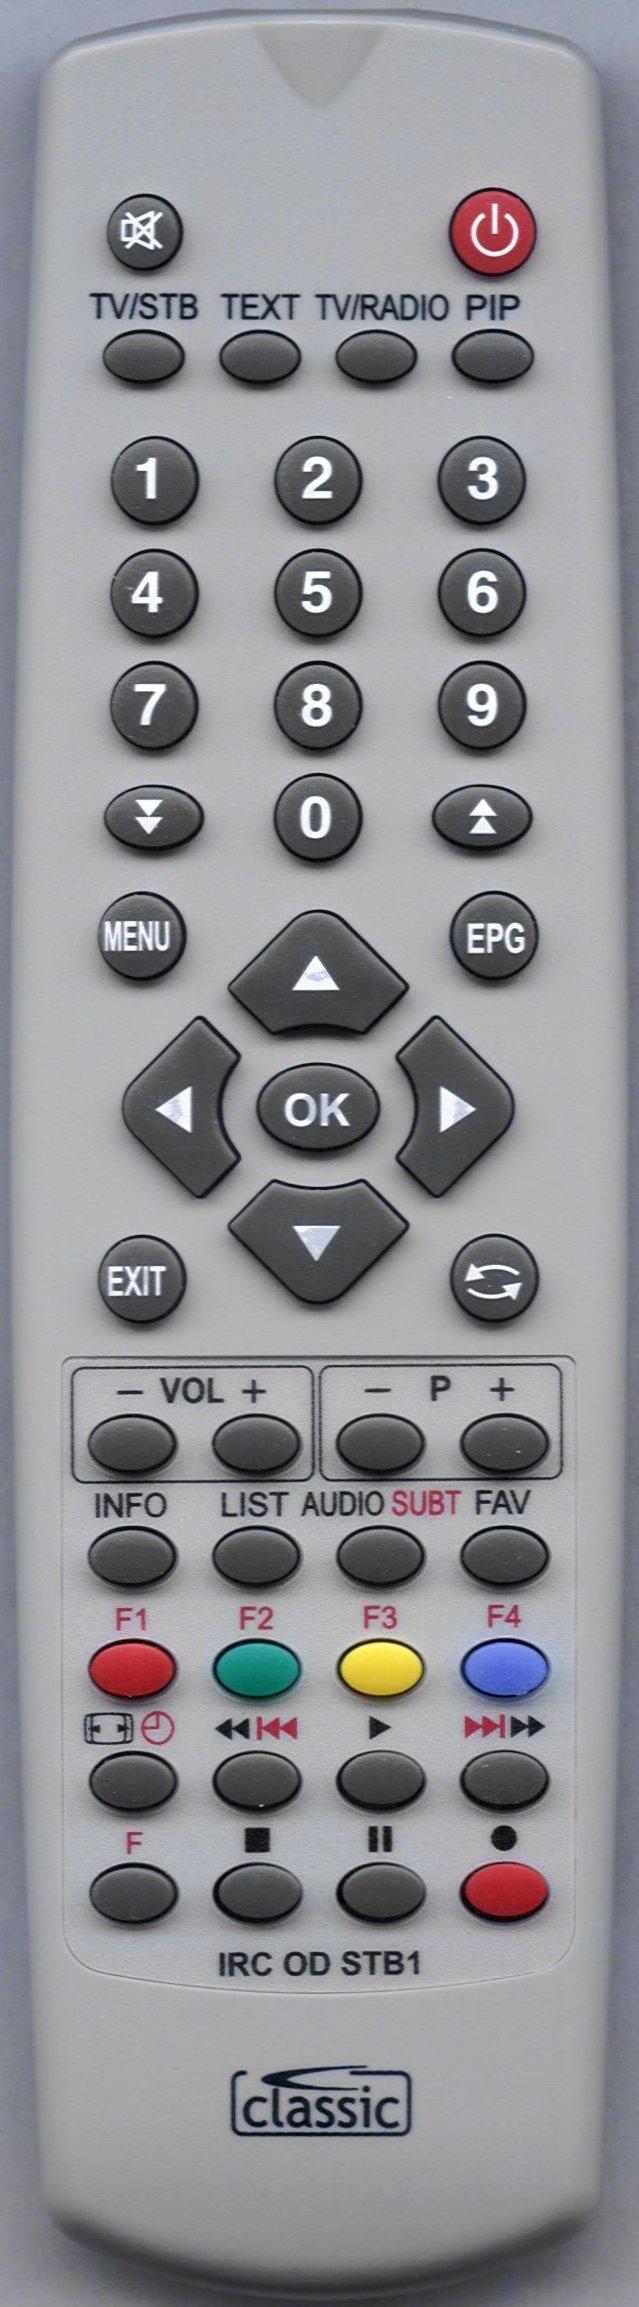 Topfield SBI-2010 Remote Control